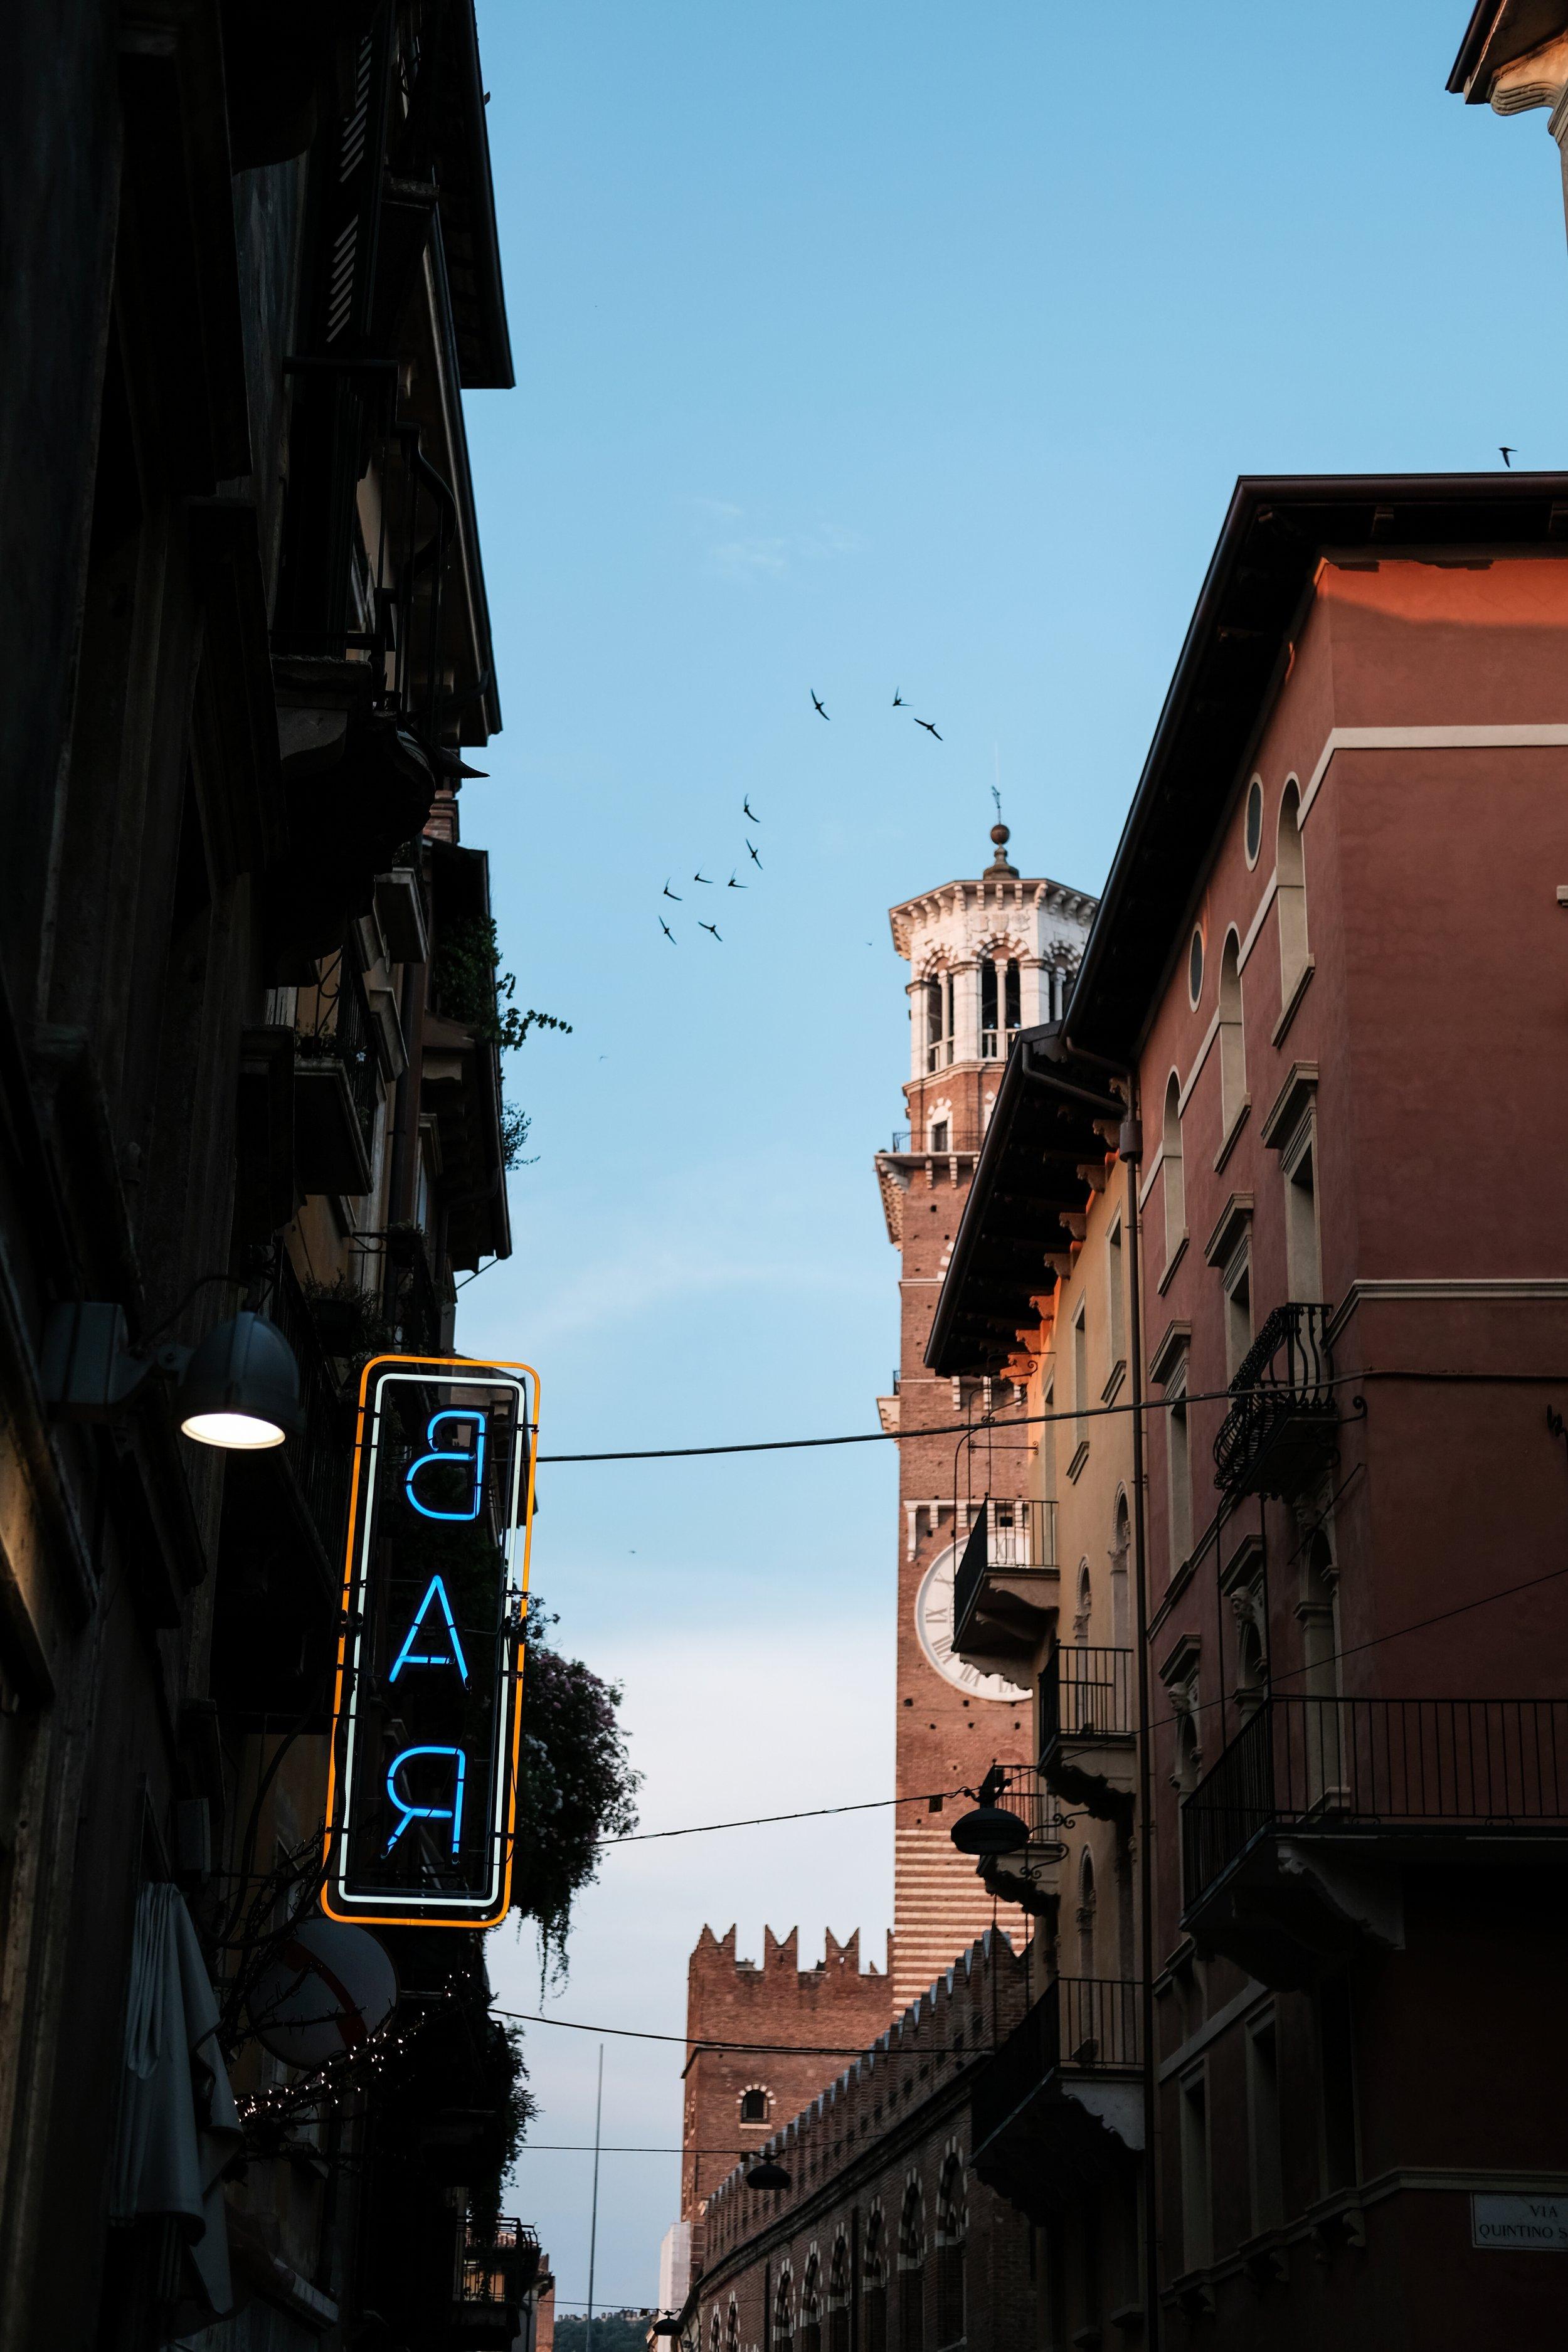 Verona, 10/7/2016, 21:24:38